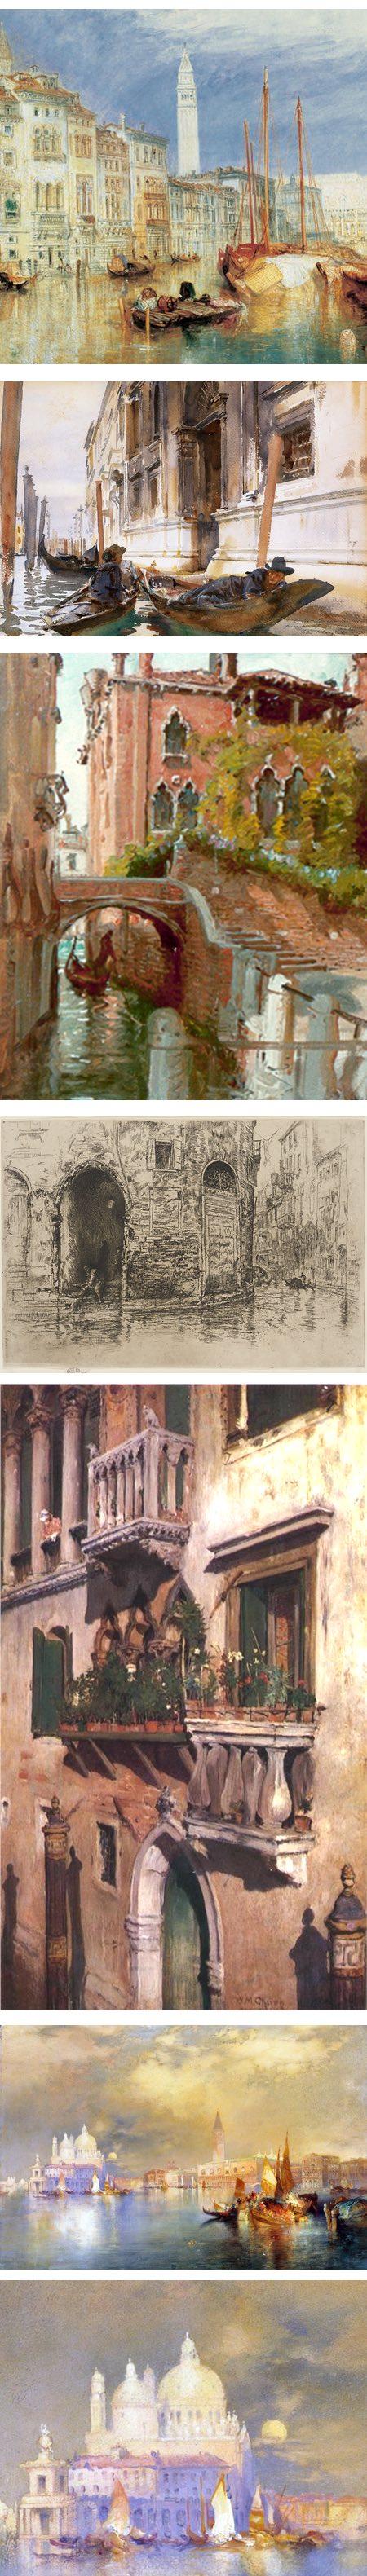 Artists views of Venice: Turner, Sargent, Anna Richards Brewster, Whistler, William Merritt Chase, Thomas Moran